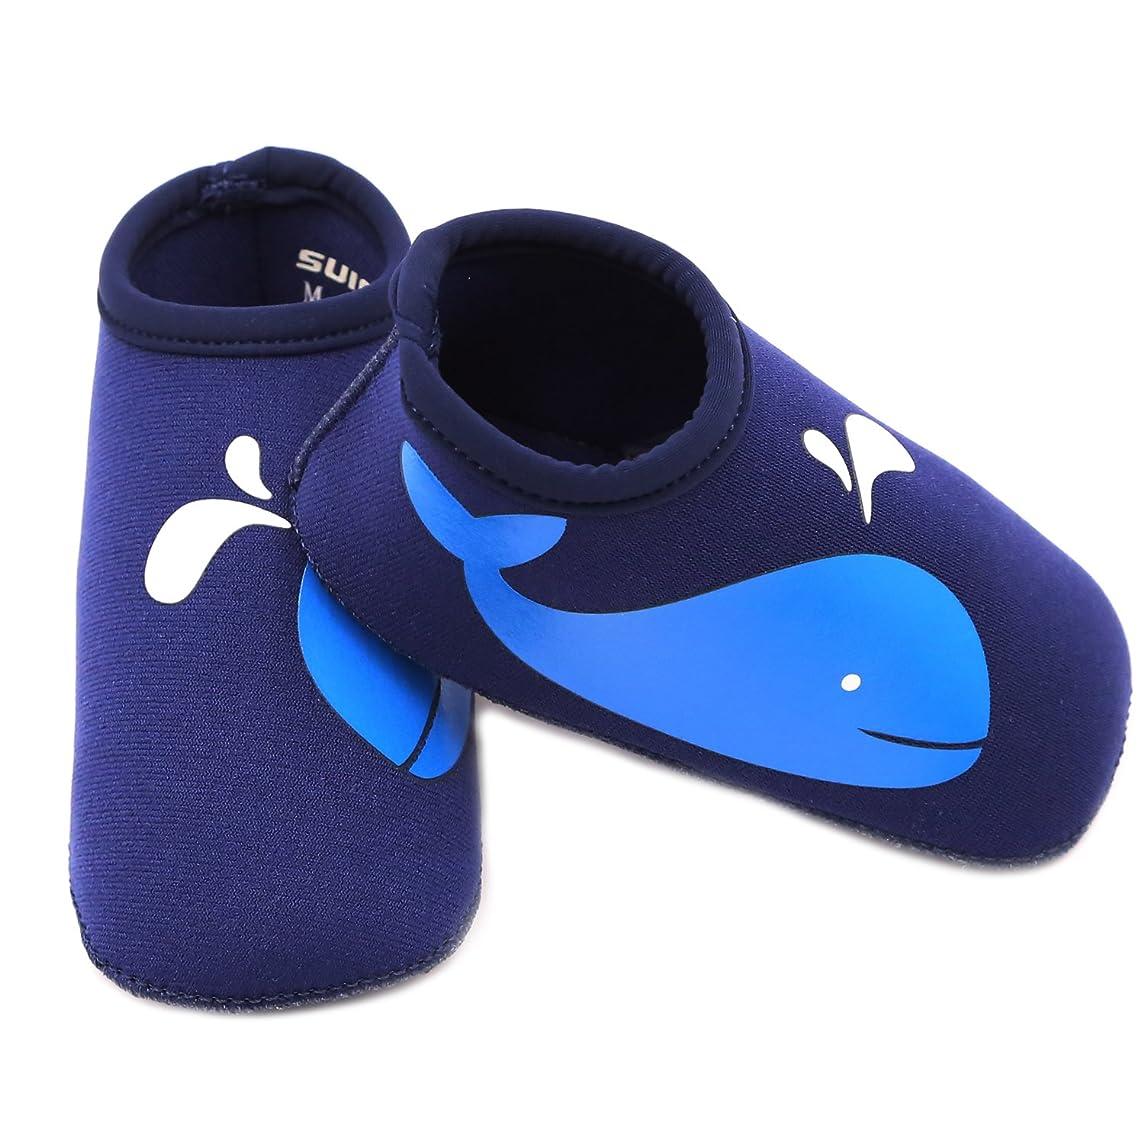 SUIEK Baby Boys Girls Swim Water Shoes Infant Pool Beach Sand Barefoot Aqua Socks